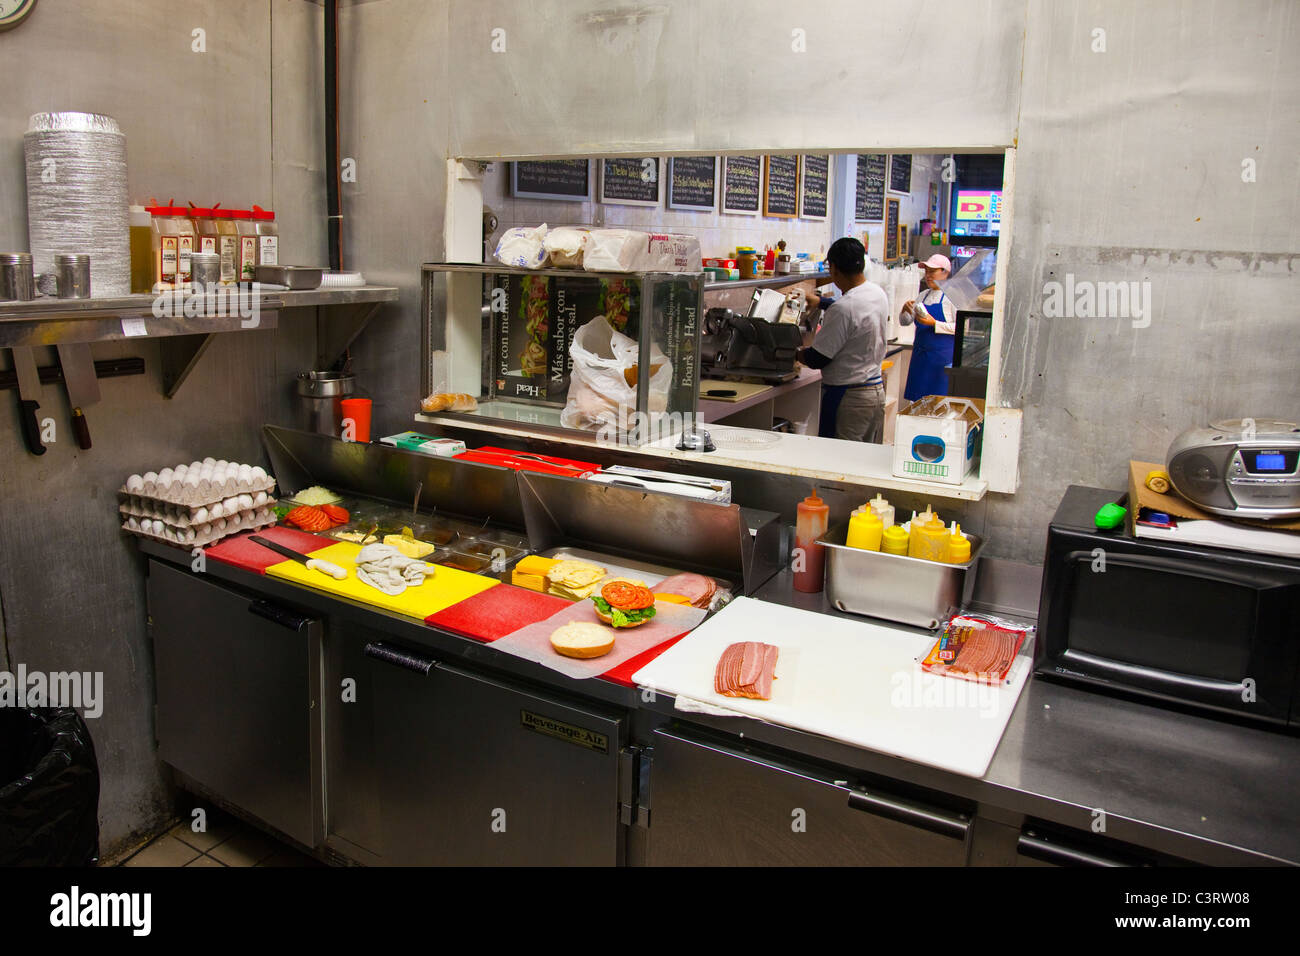 Kitchen inside a deli in Manhattan, New York City - Stock Image